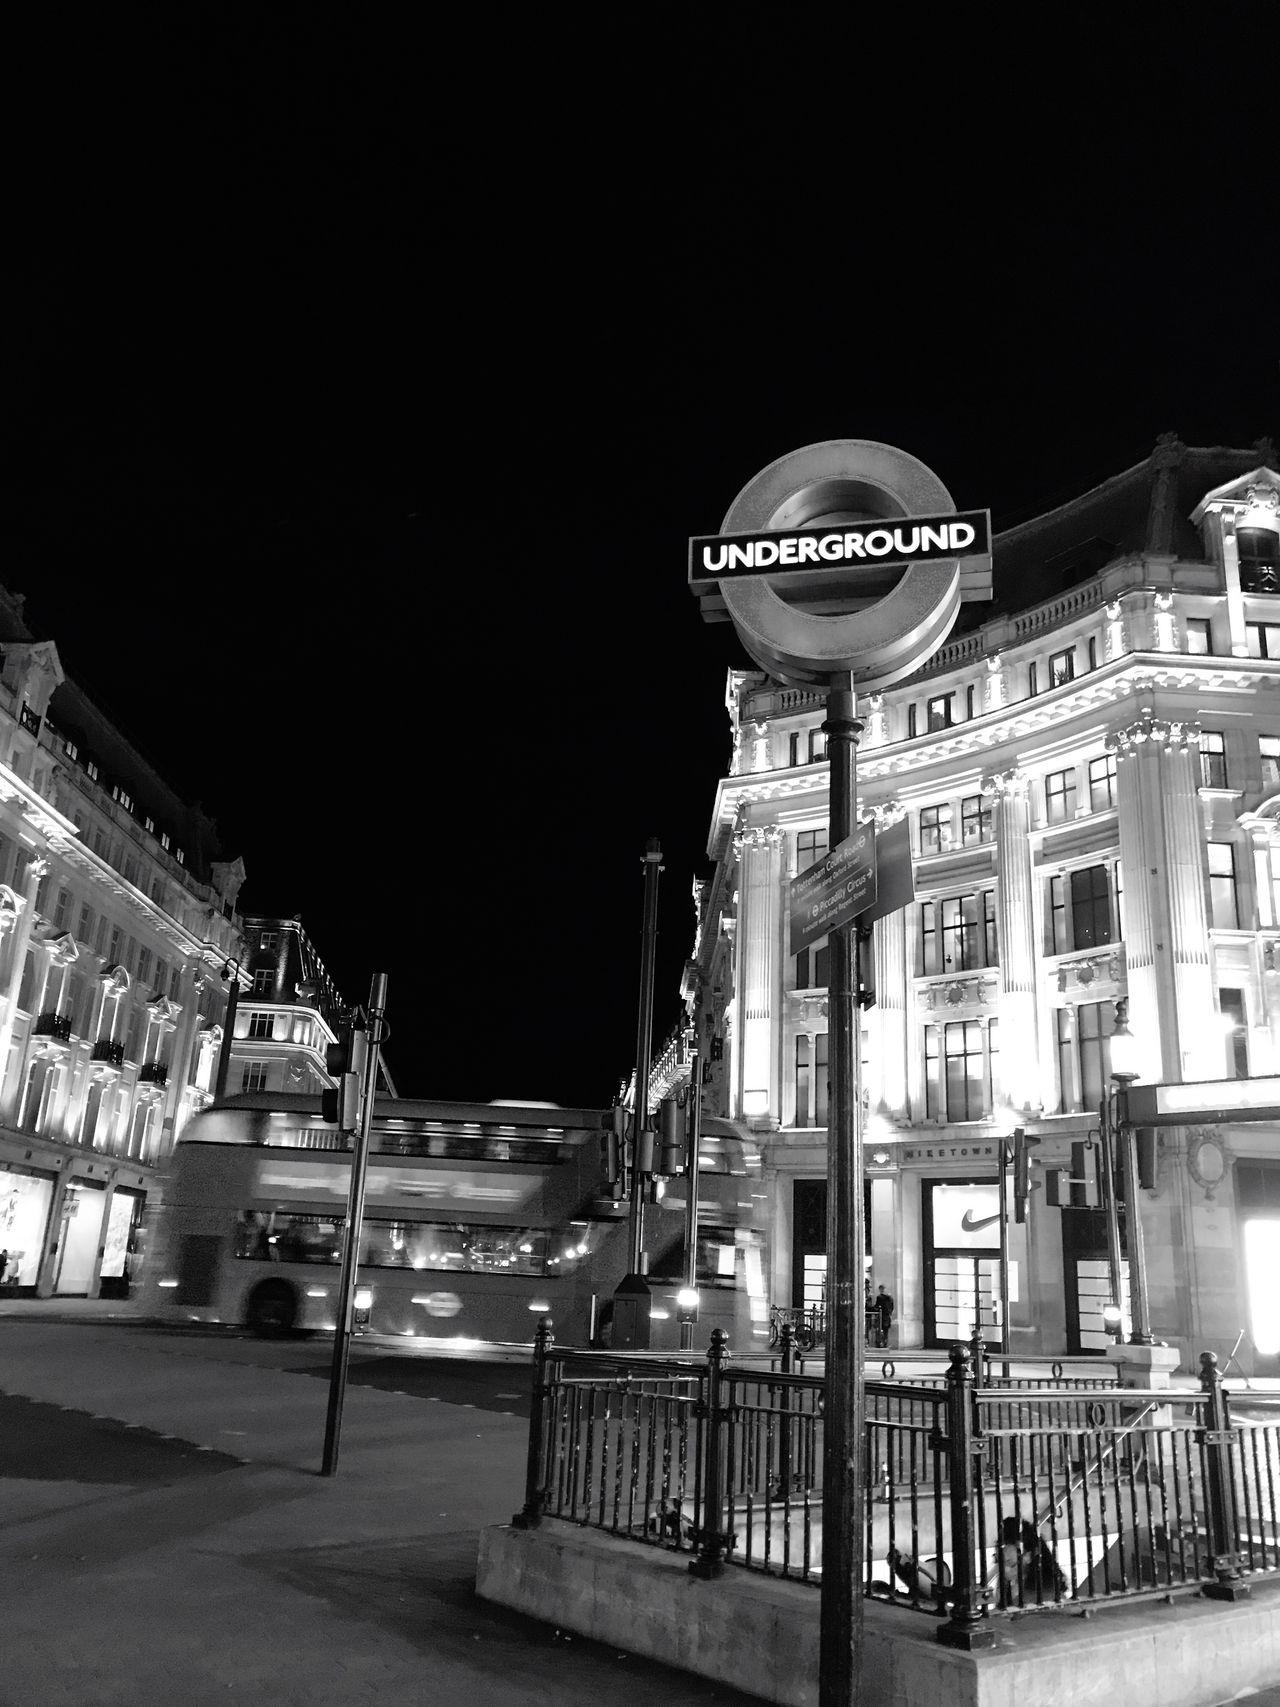 Night Architecture Building Exterior Built Structure Illuminated Travel Destinations City Oxfordstreet Oxford Circus London Underground Londonbus